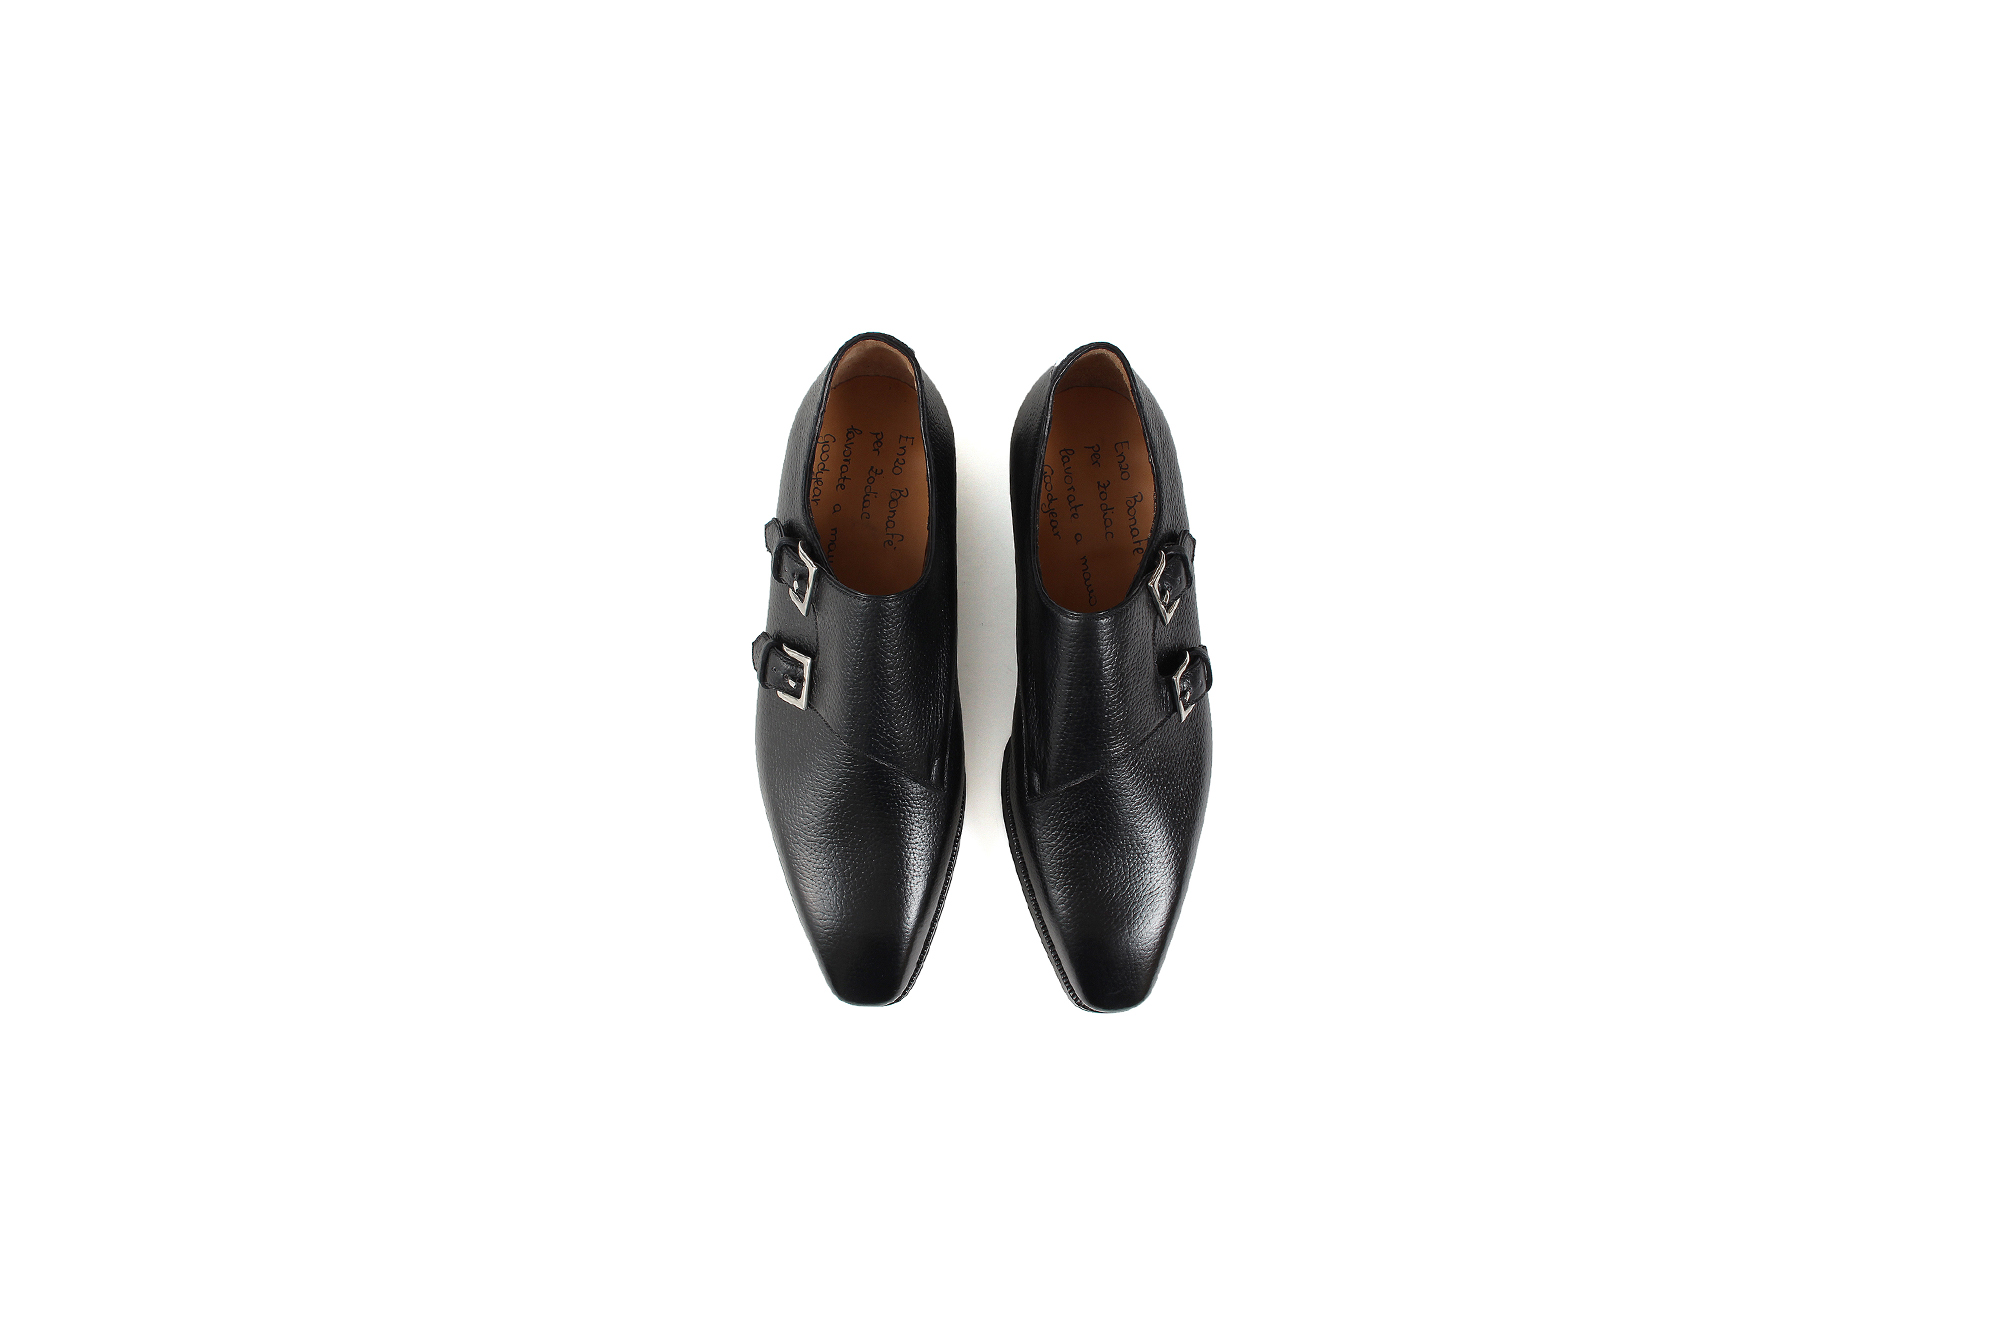 ENZO BONAFE(エンツォボナフェ) EB-36 Double Monk Strap Shoes INCA Leather ダブルモンクストラップシューズ NERO (ブラック) made in italy (イタリア製) 2020  enzobonafe eb36 エンツォボナフェ altoediritto アルトエデリット